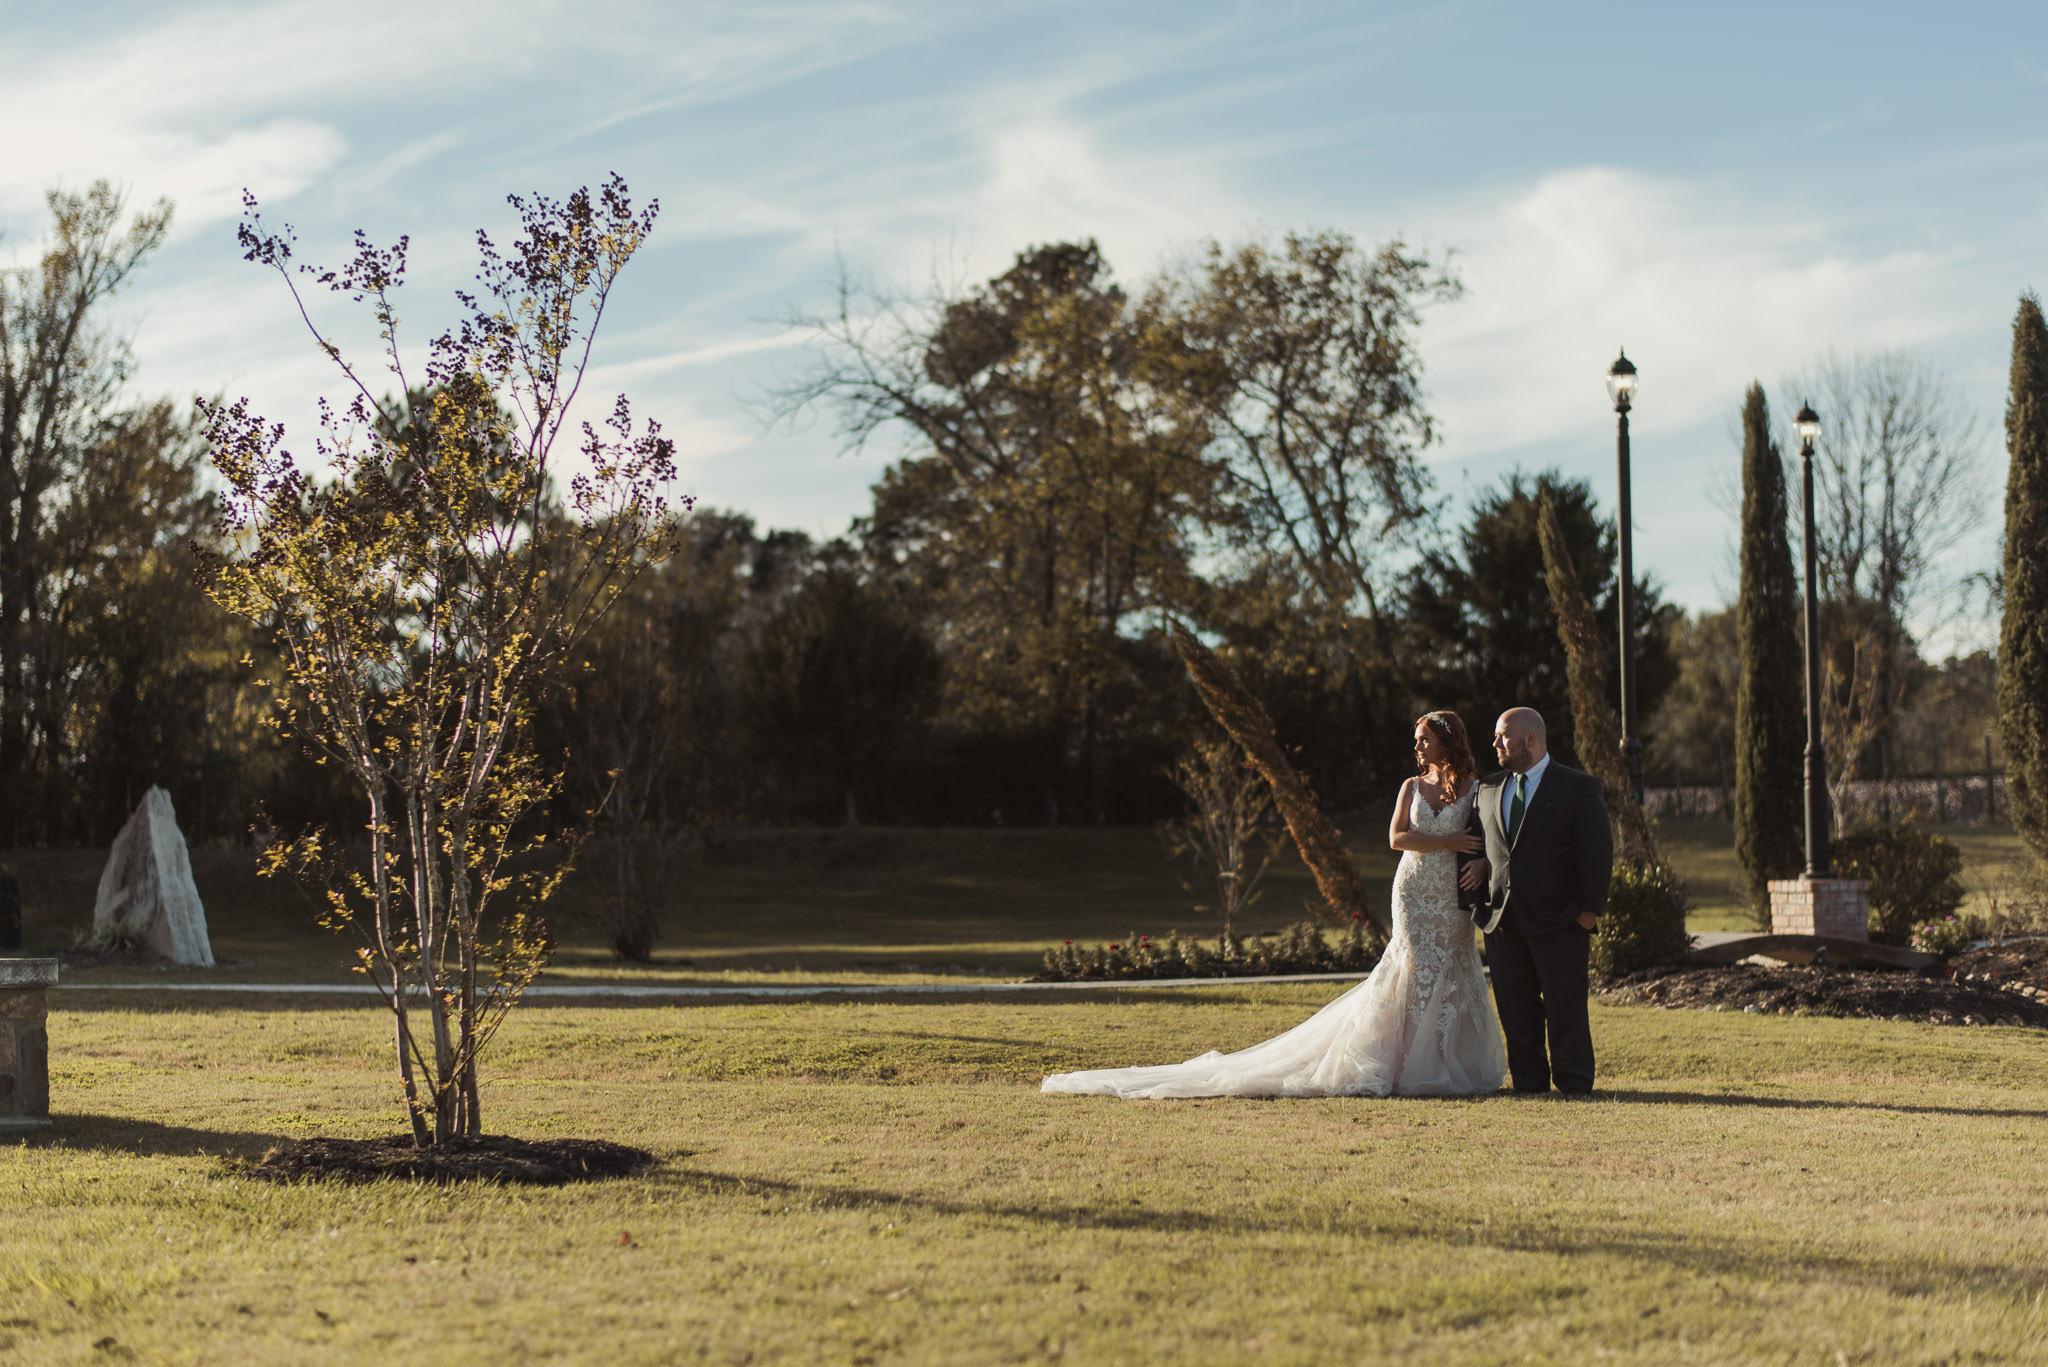 Cynthia-Curtis-Olde-Dobbine-Station-Houston-Wedding-Photographer-sm-49.jpg